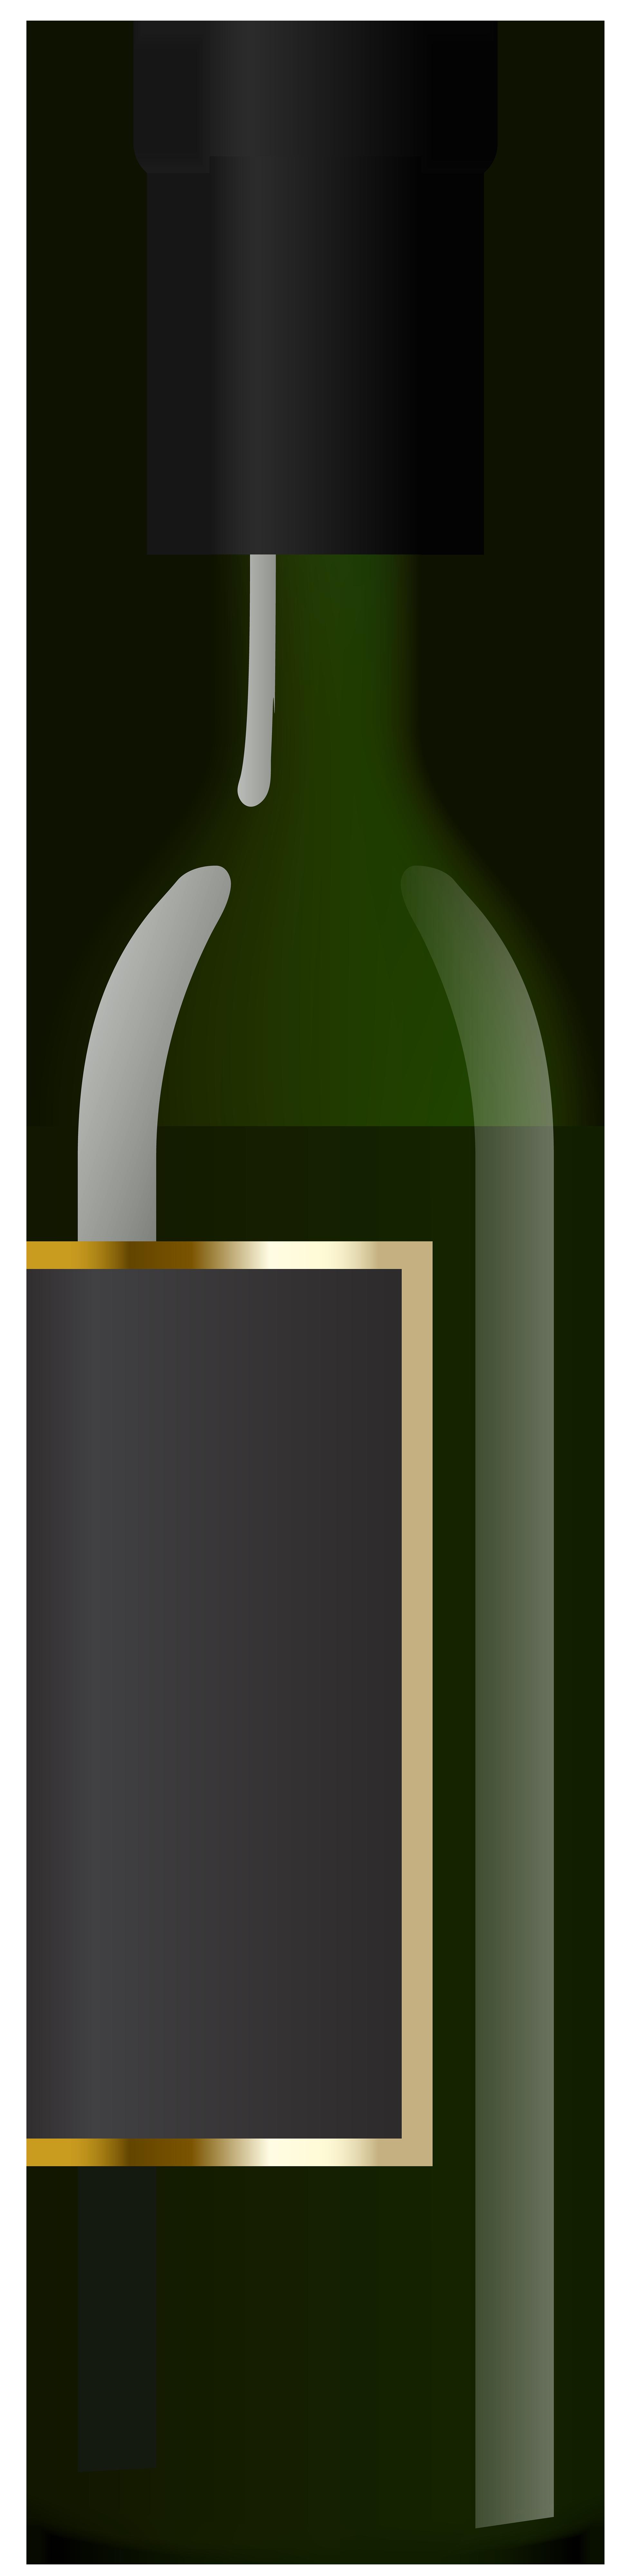 Bottle transparent png clip. Clipart halloween wine